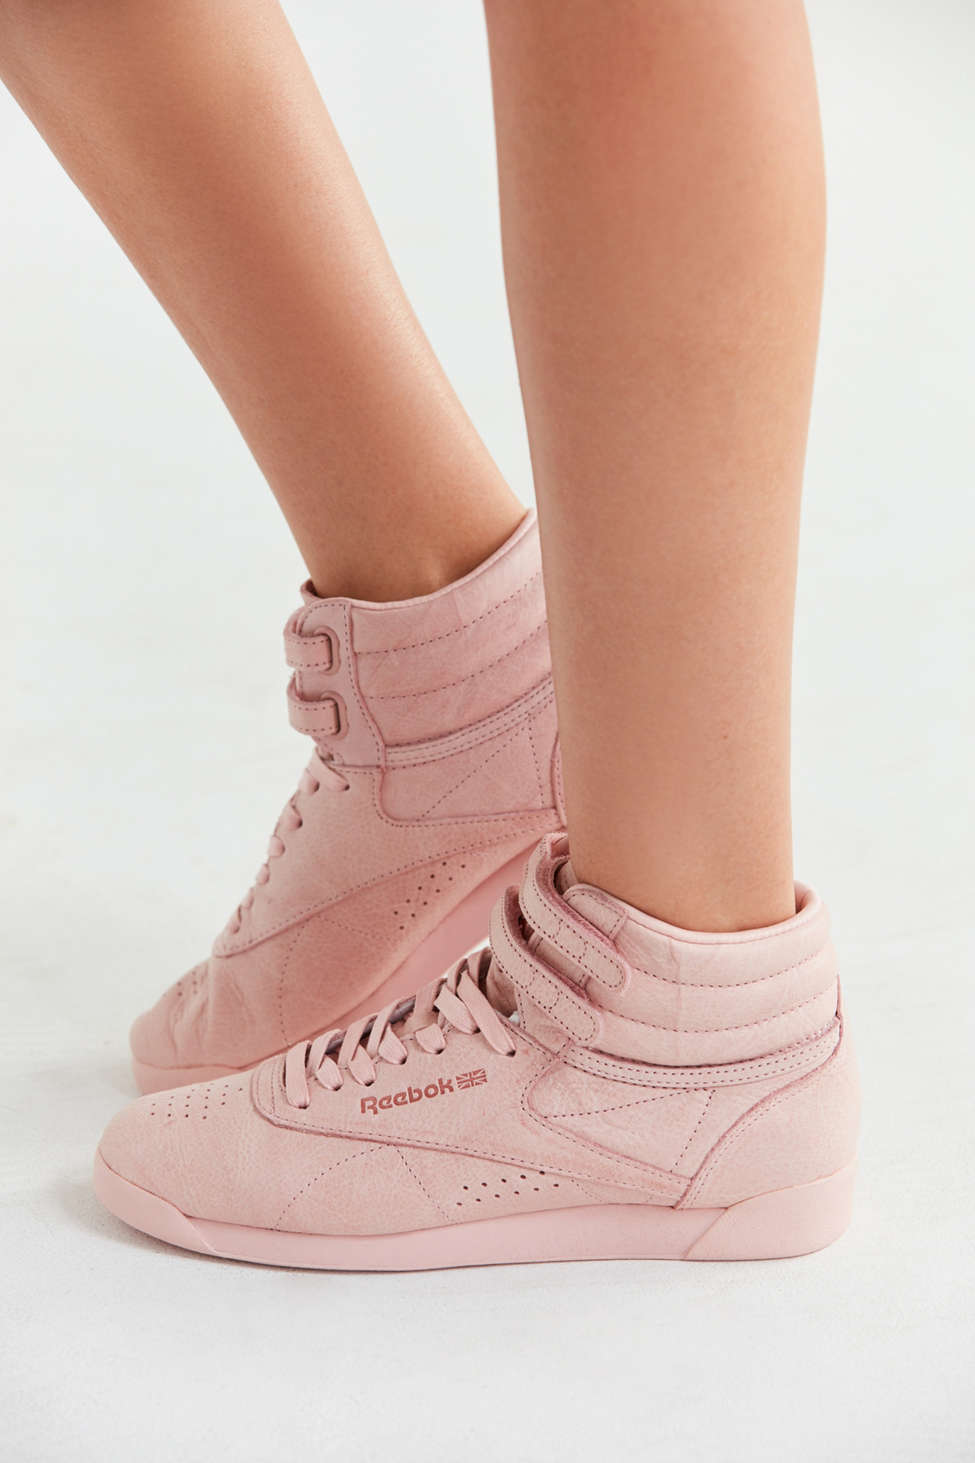 Reebok Freestyle Hi FBT sneakers